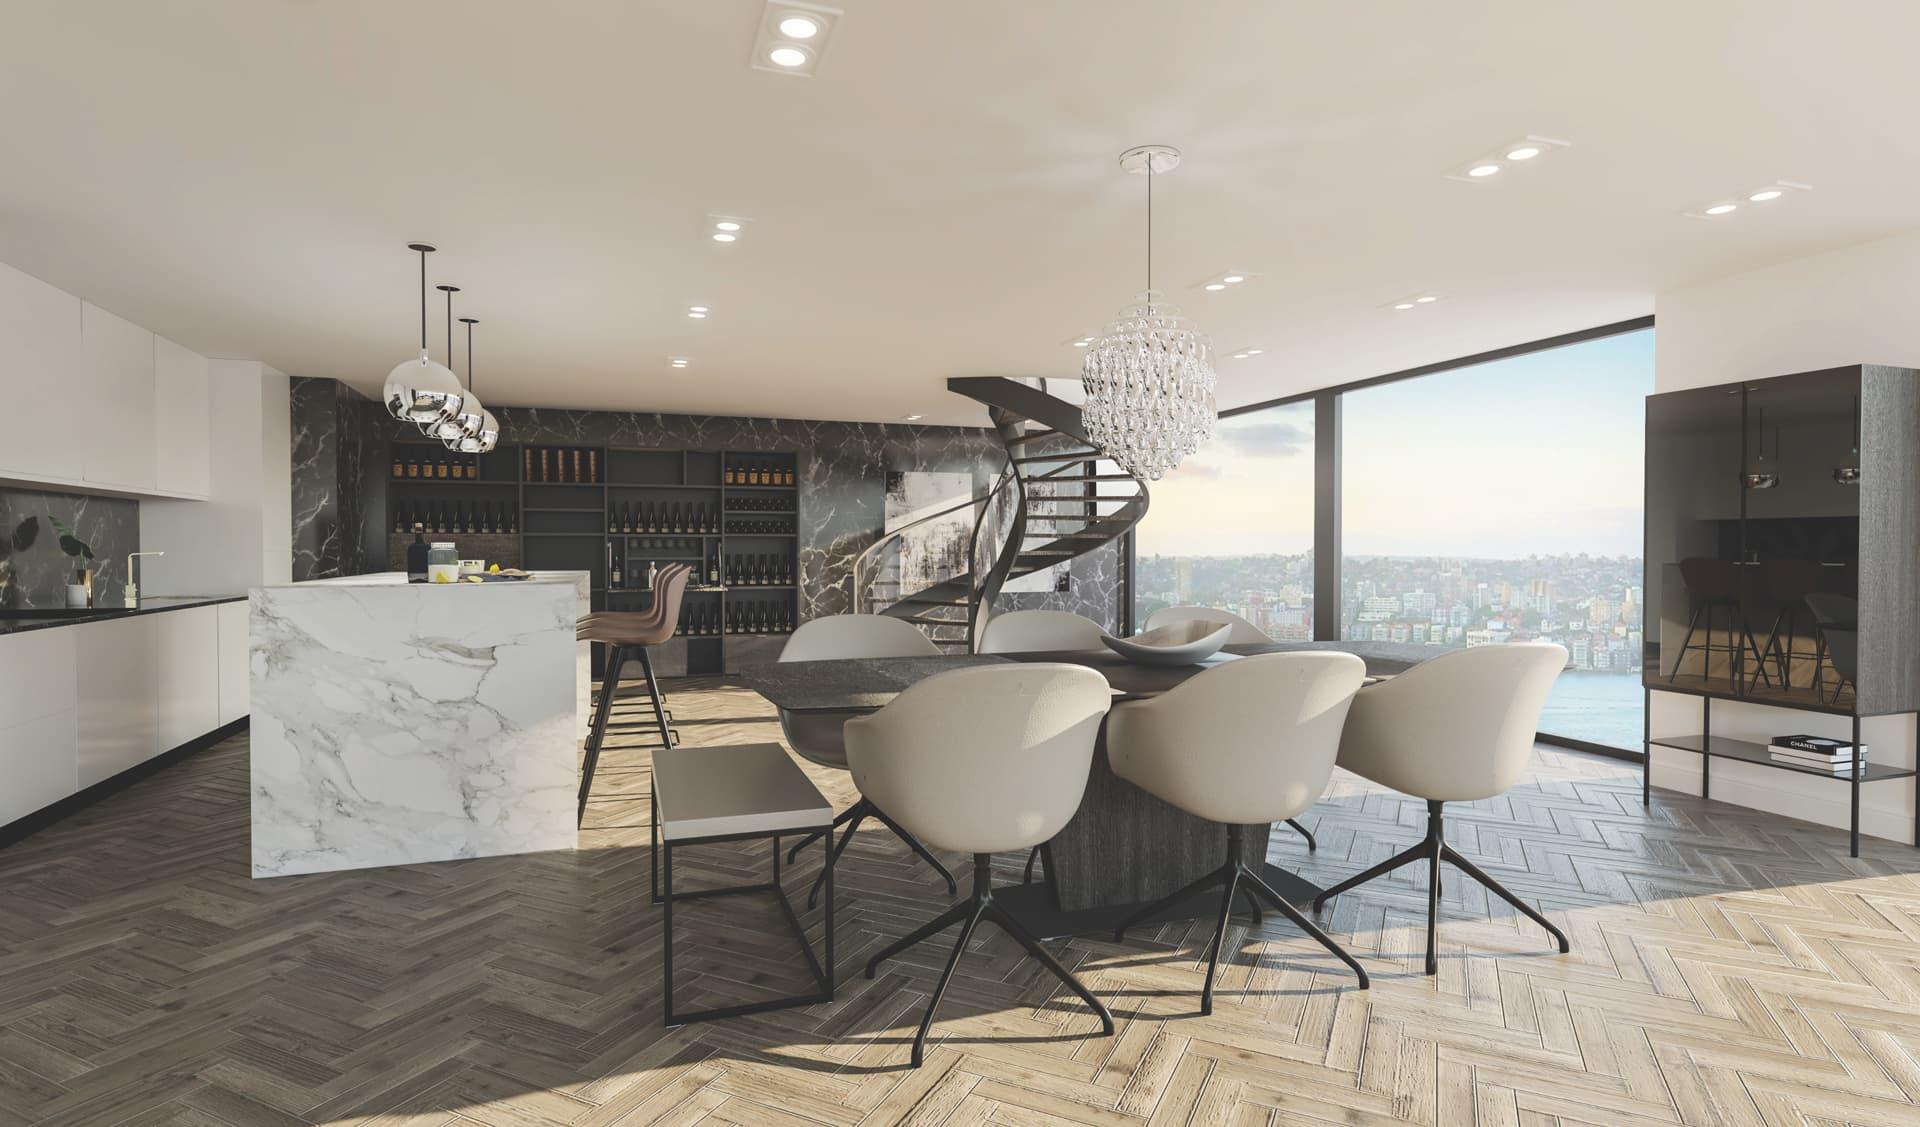 4/12 Dining Room, Loft, Design Package